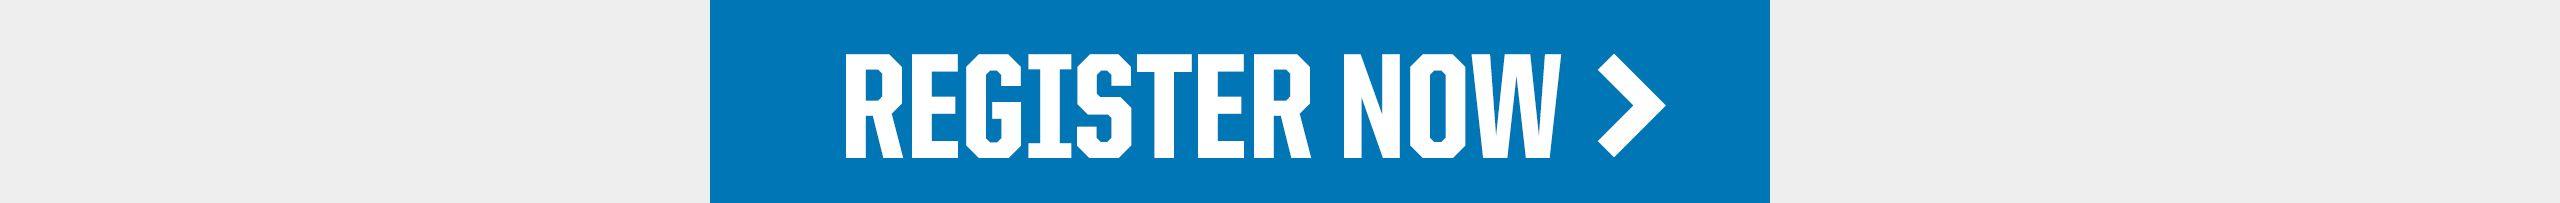 register-now-btn